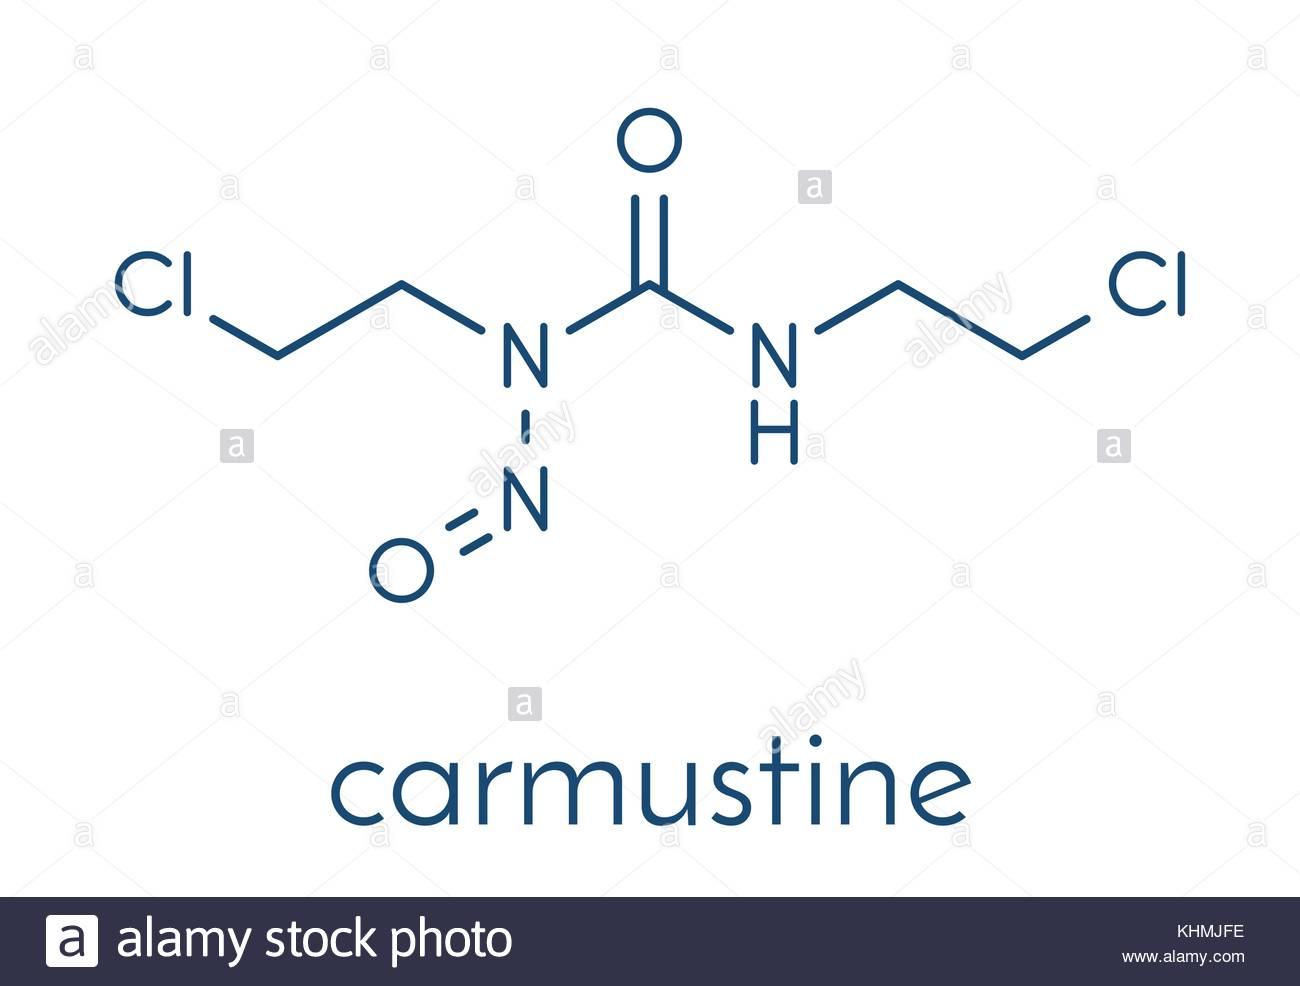 La carmustina (BCNU), medicamentos de quimioterapia del cáncer molécula  fórmula esquelética. Imagen